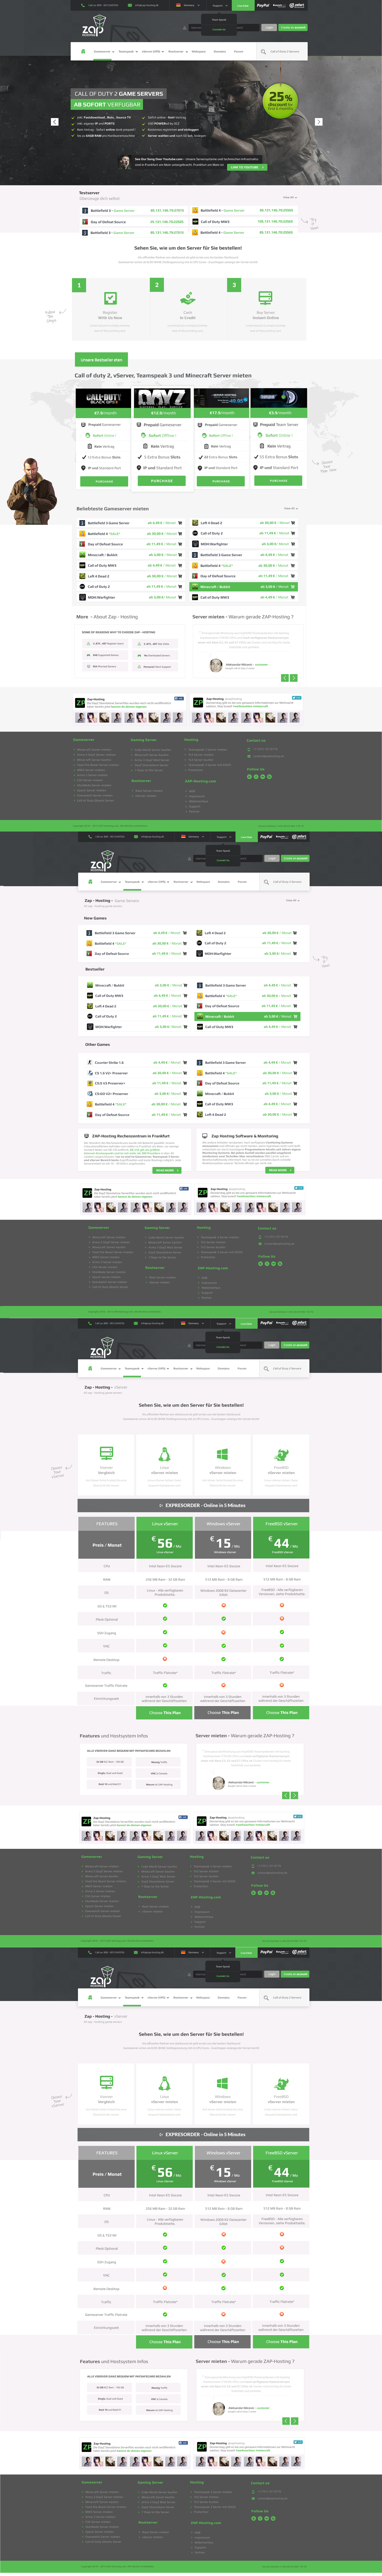 Game Hosting Web Design by vasiligfx